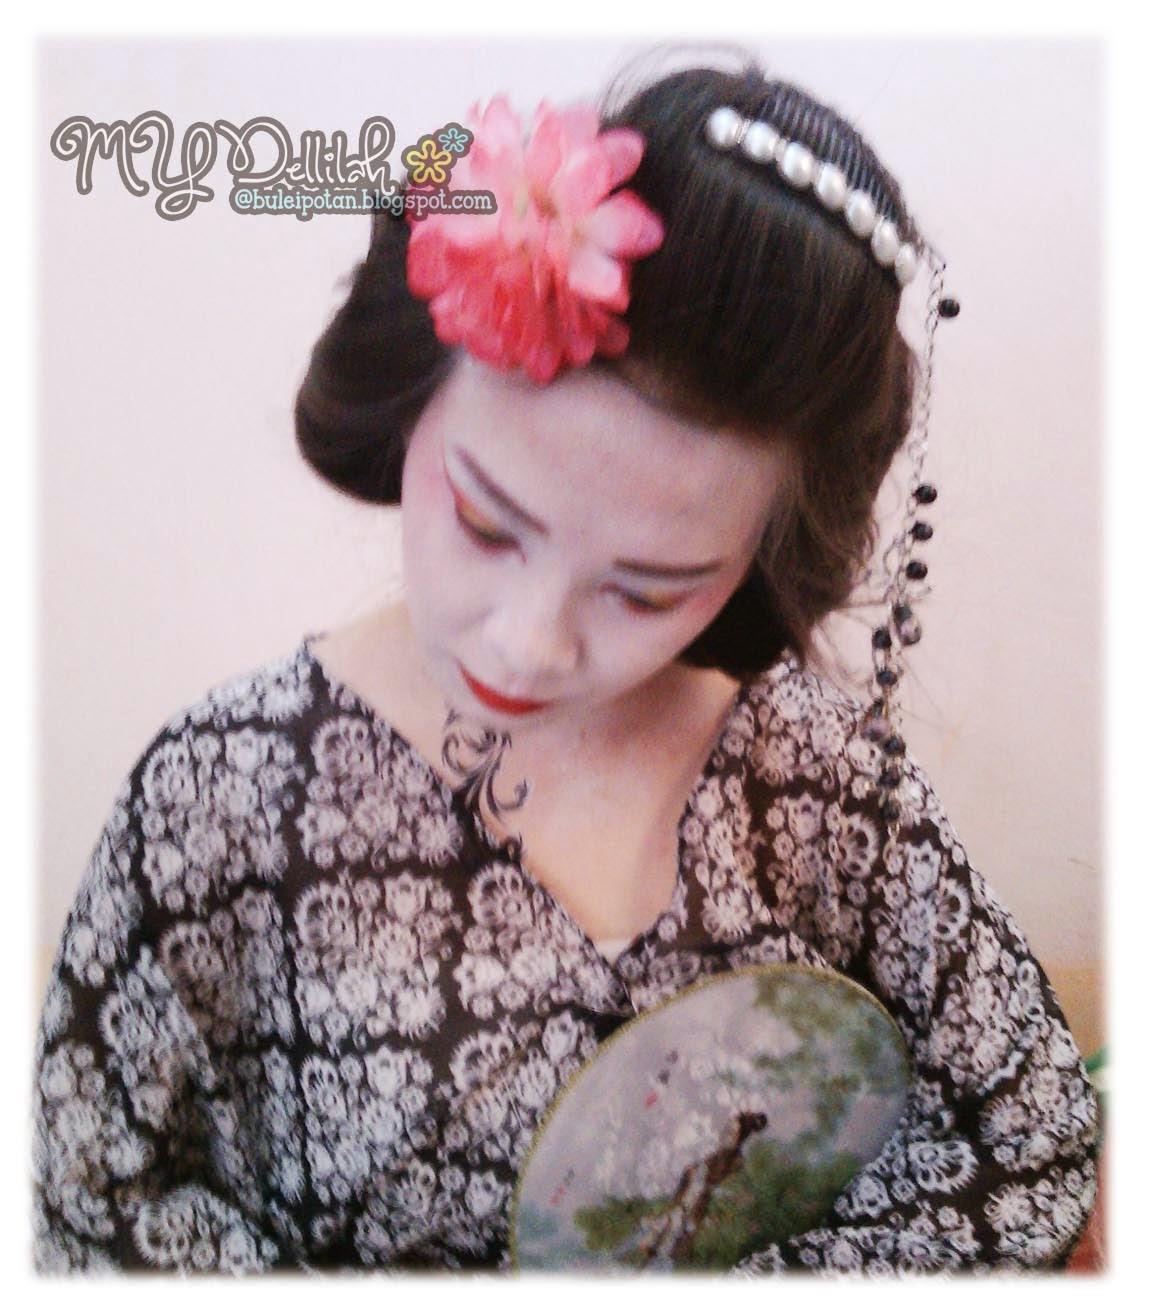 Apa itu Geisha